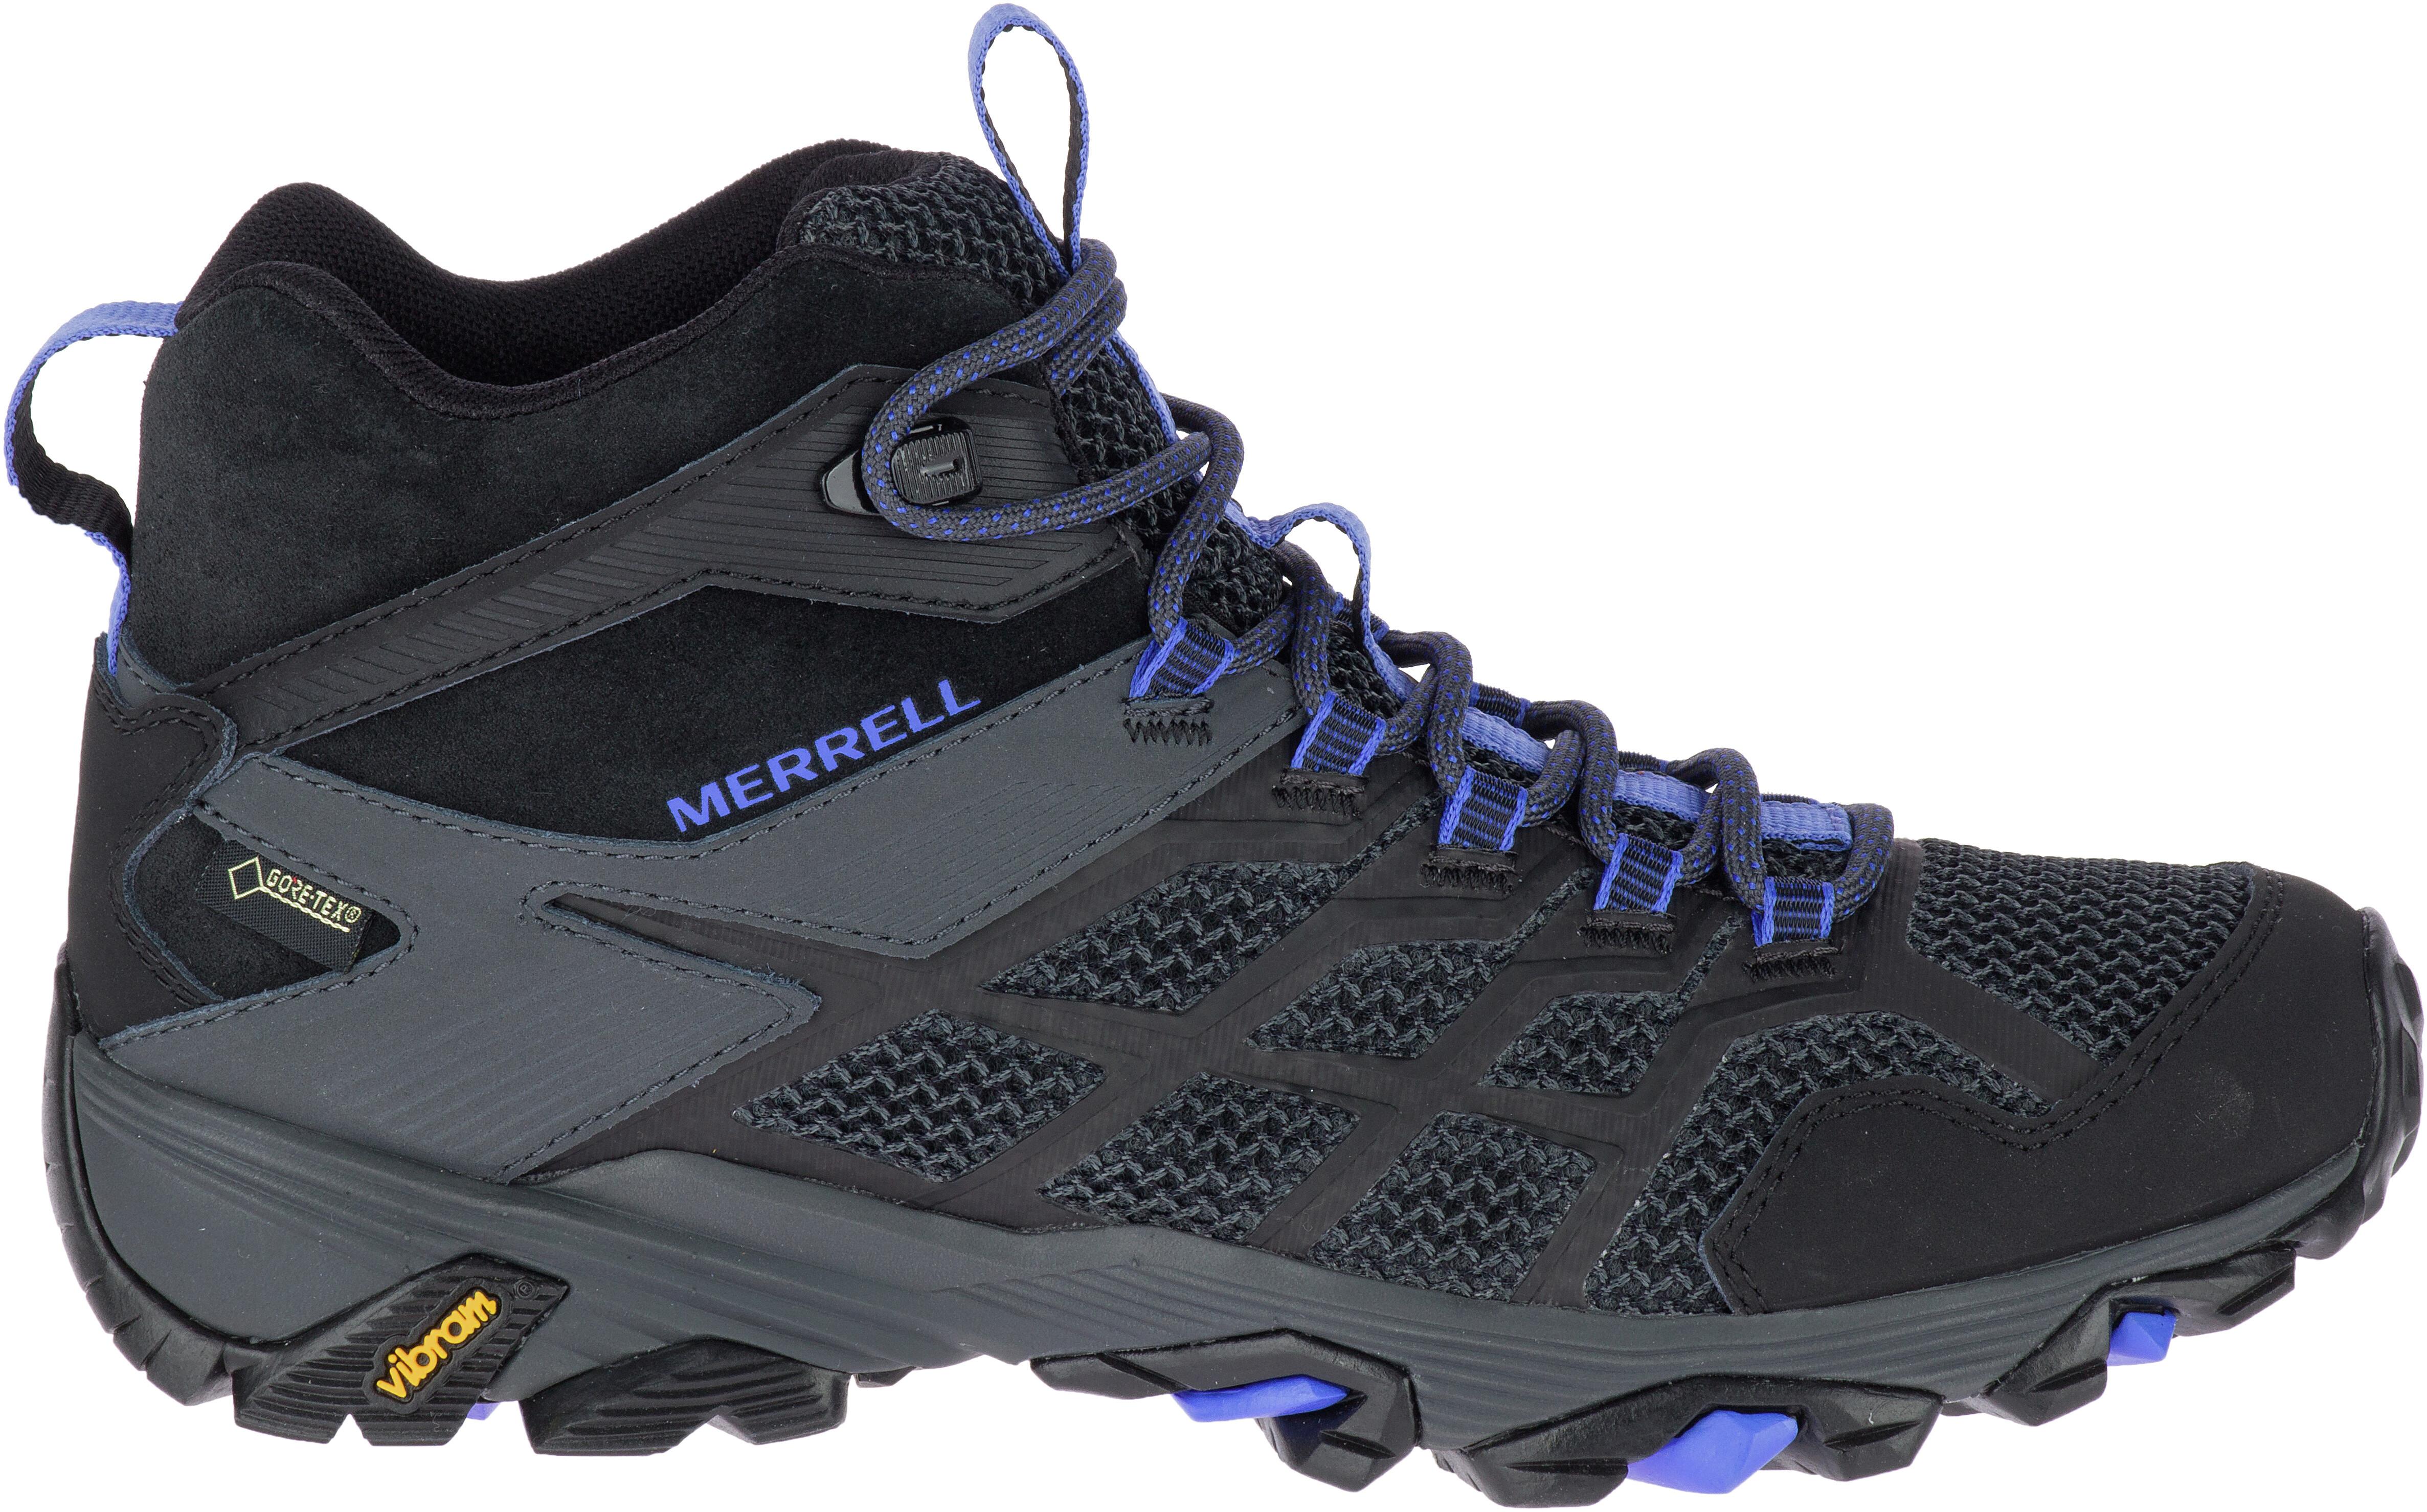 f9f9488bbea Merrell Moab FST 2 Mid GTX Sko Damer sort | Find outdoortøj, sko ...